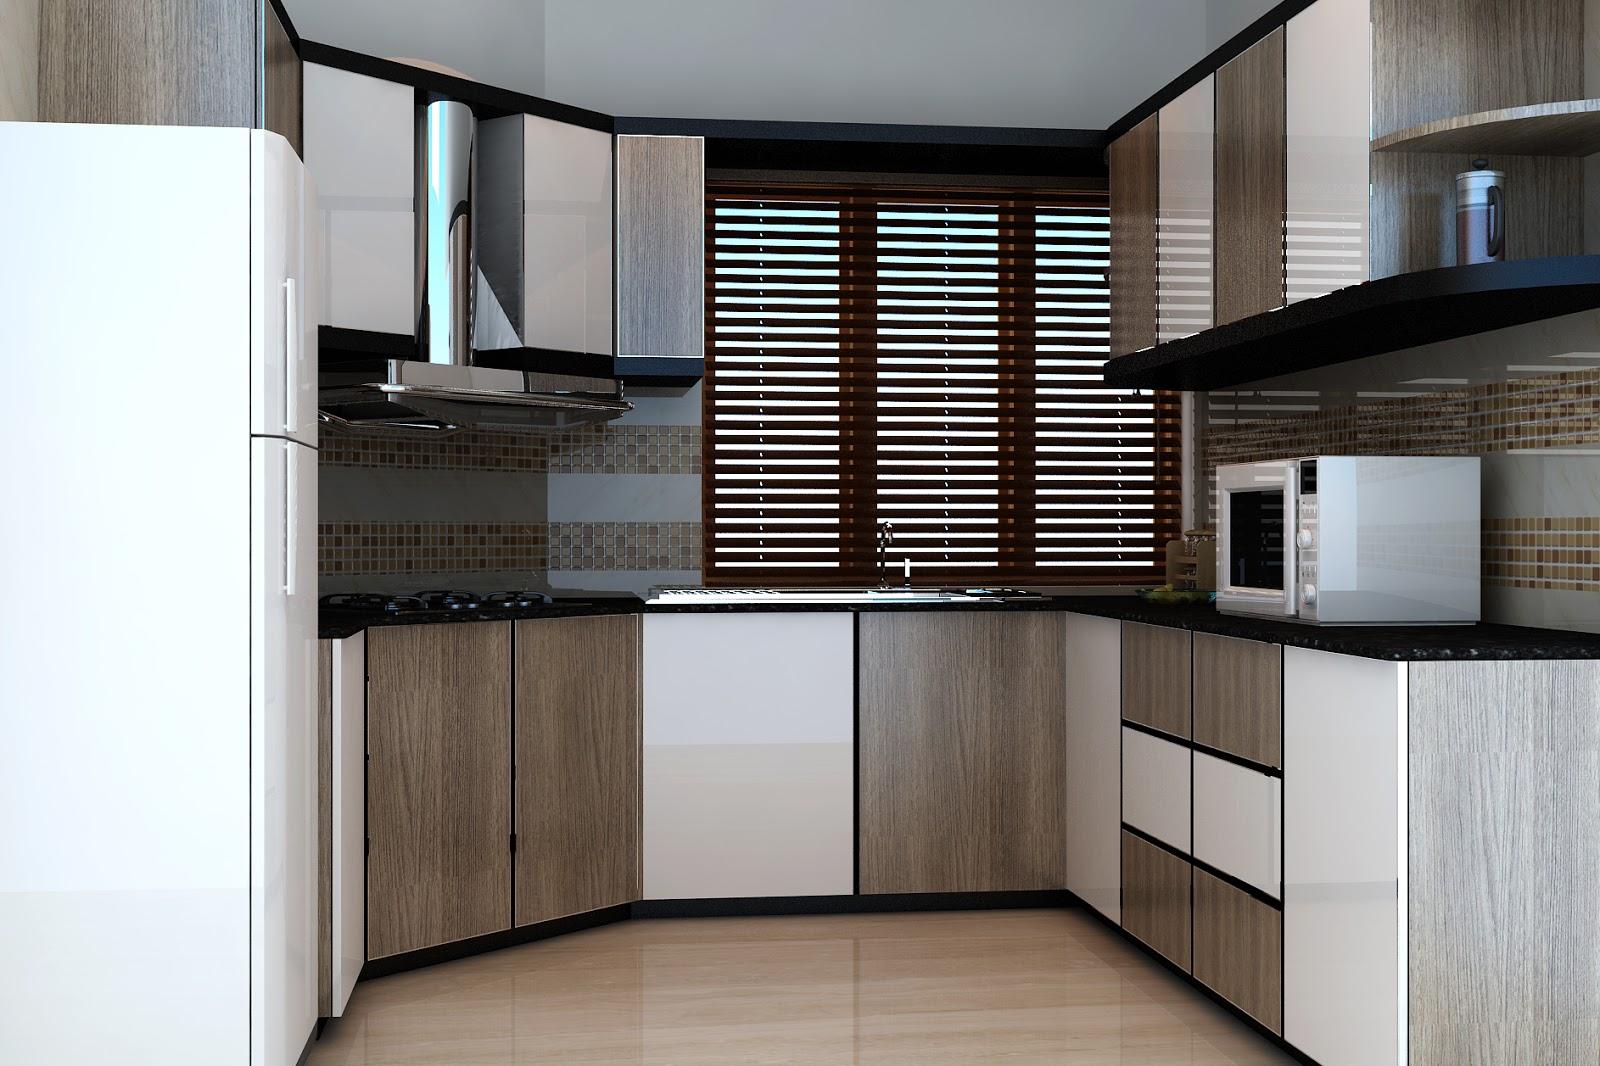 Shyam Clement A Kitchen Design KottayamKerala - Kerala kitchen design pictures